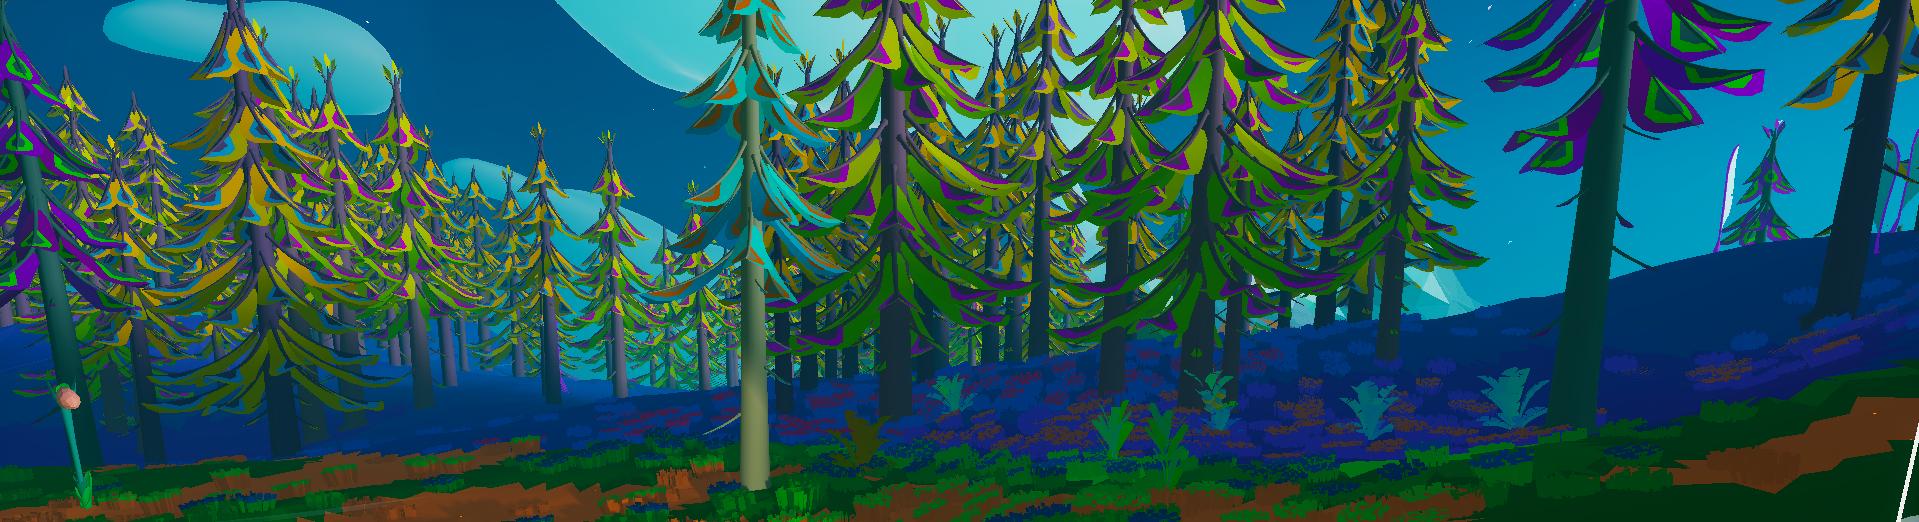 Граница леса.png